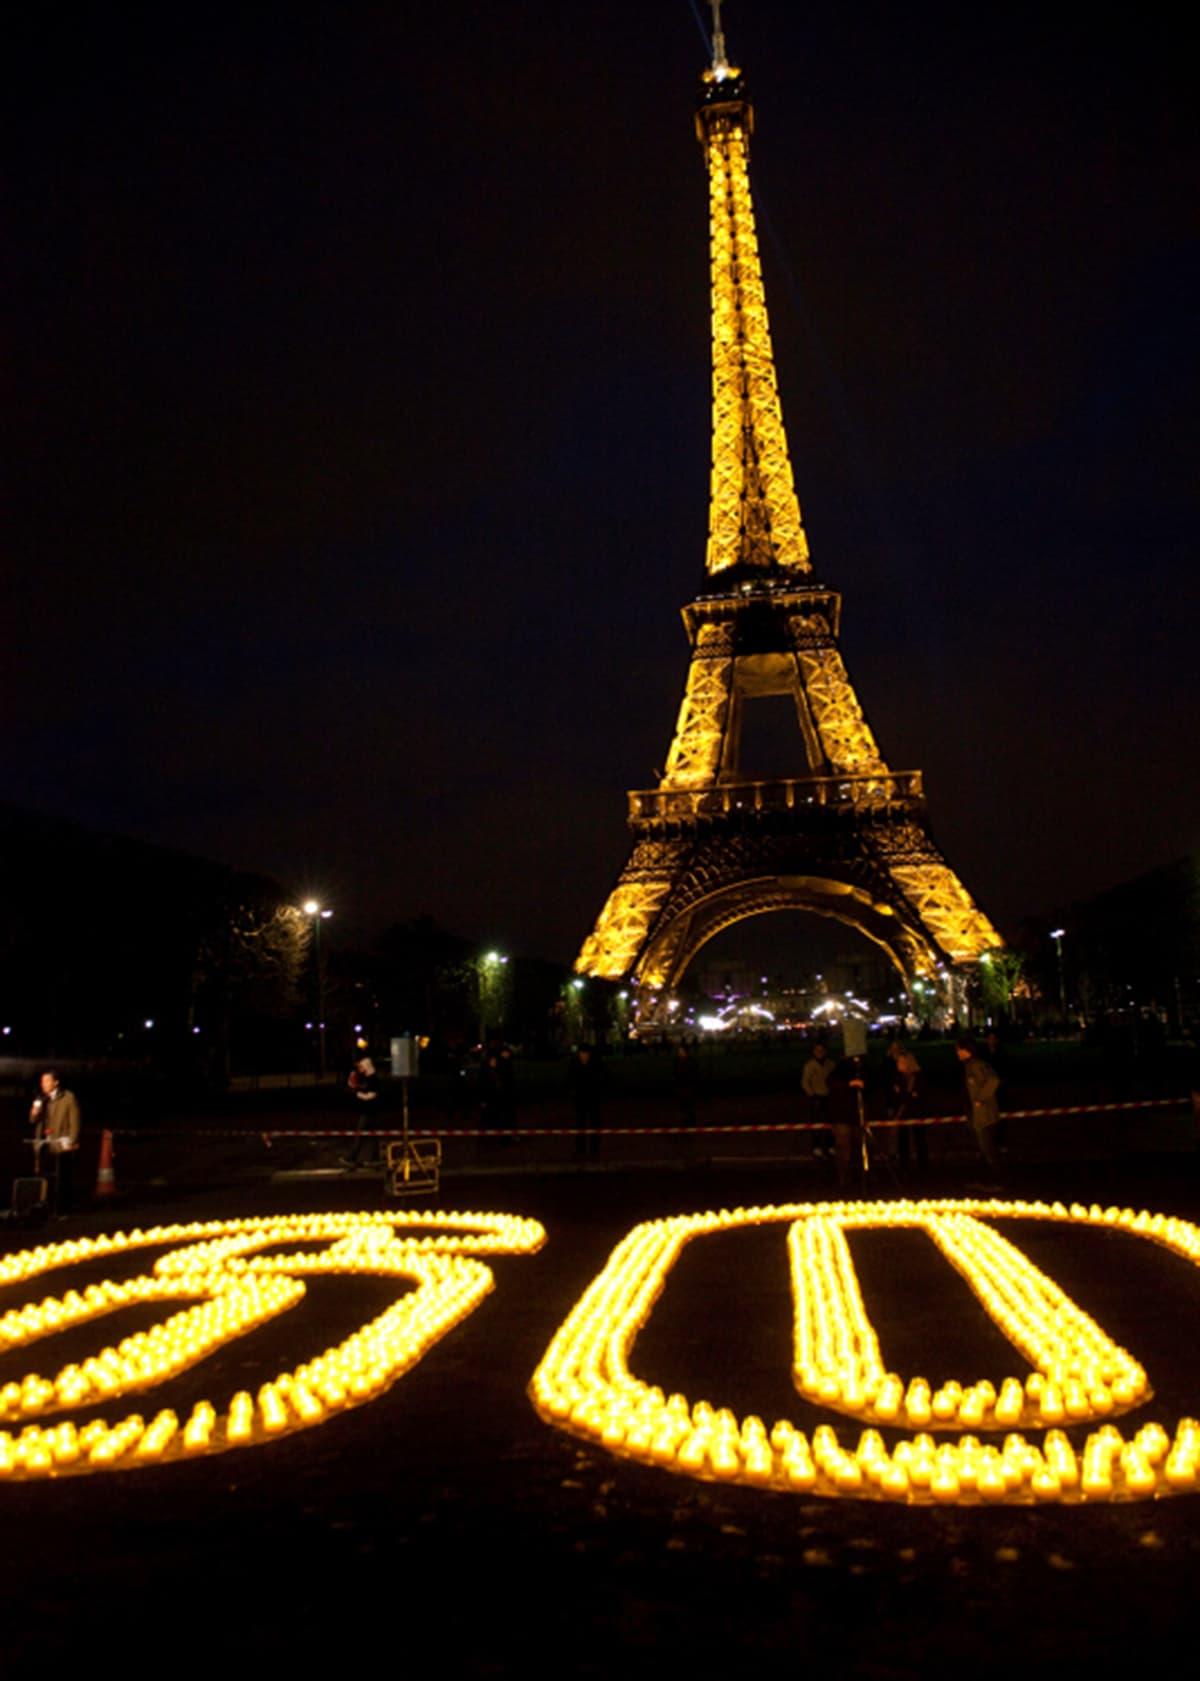 Candles forming 60 for Earth Hour near the Eiffel Tower Paris France.—  WWF / Nina Munn